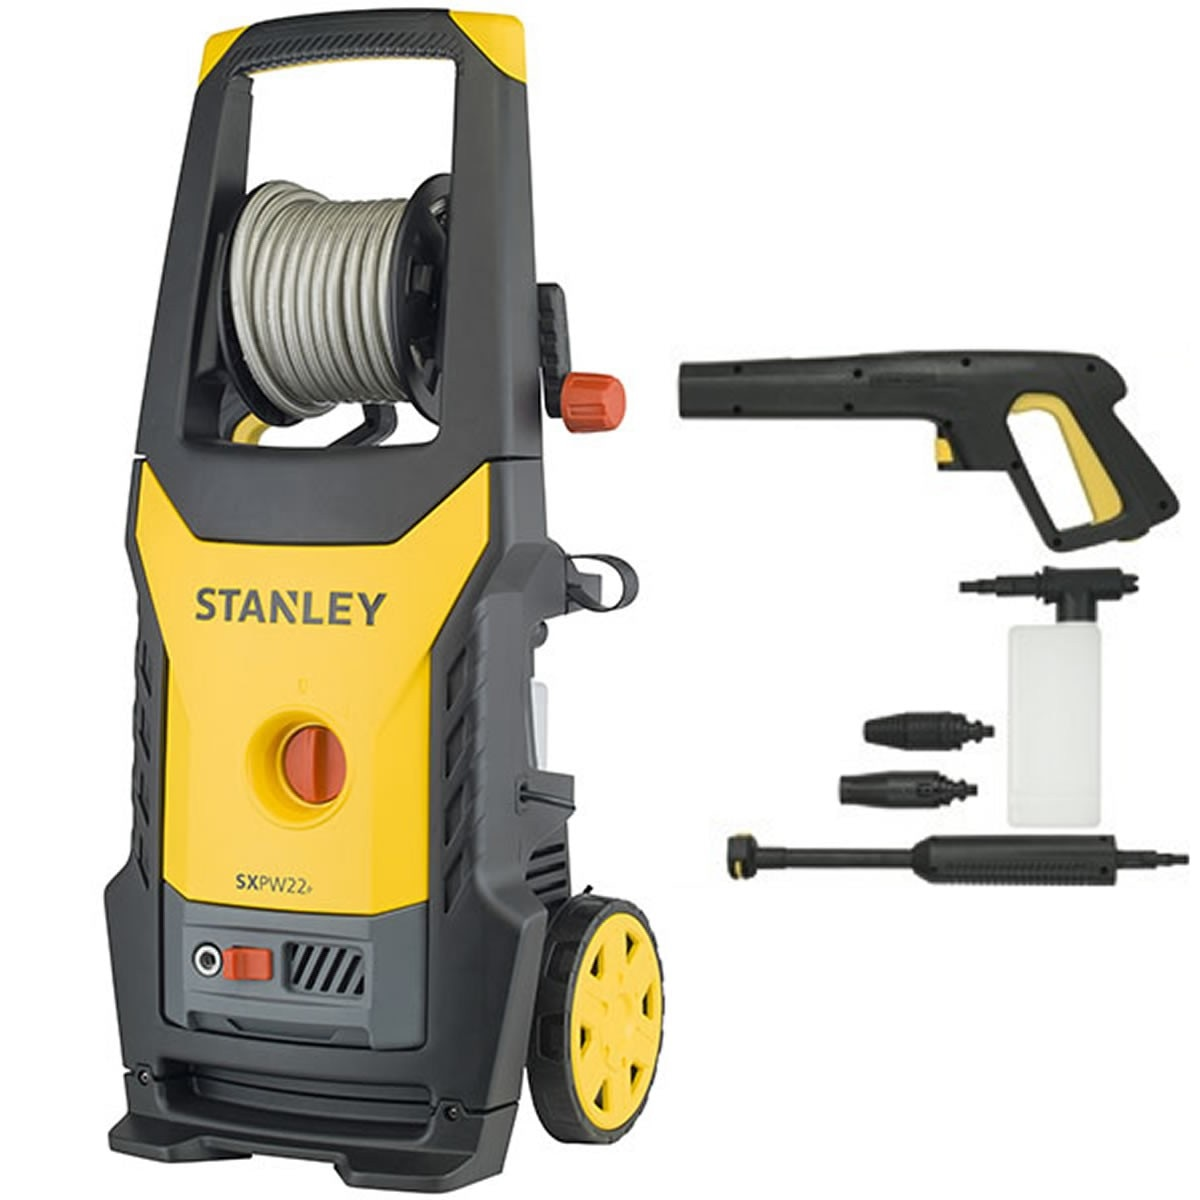 Fotografie Aparat de spalat cu presiune Stanley, 2.2 kW, 150 bar, 440 L/H, accesorii incluse: lance, pistol, bidon detergent, furtun 8 m